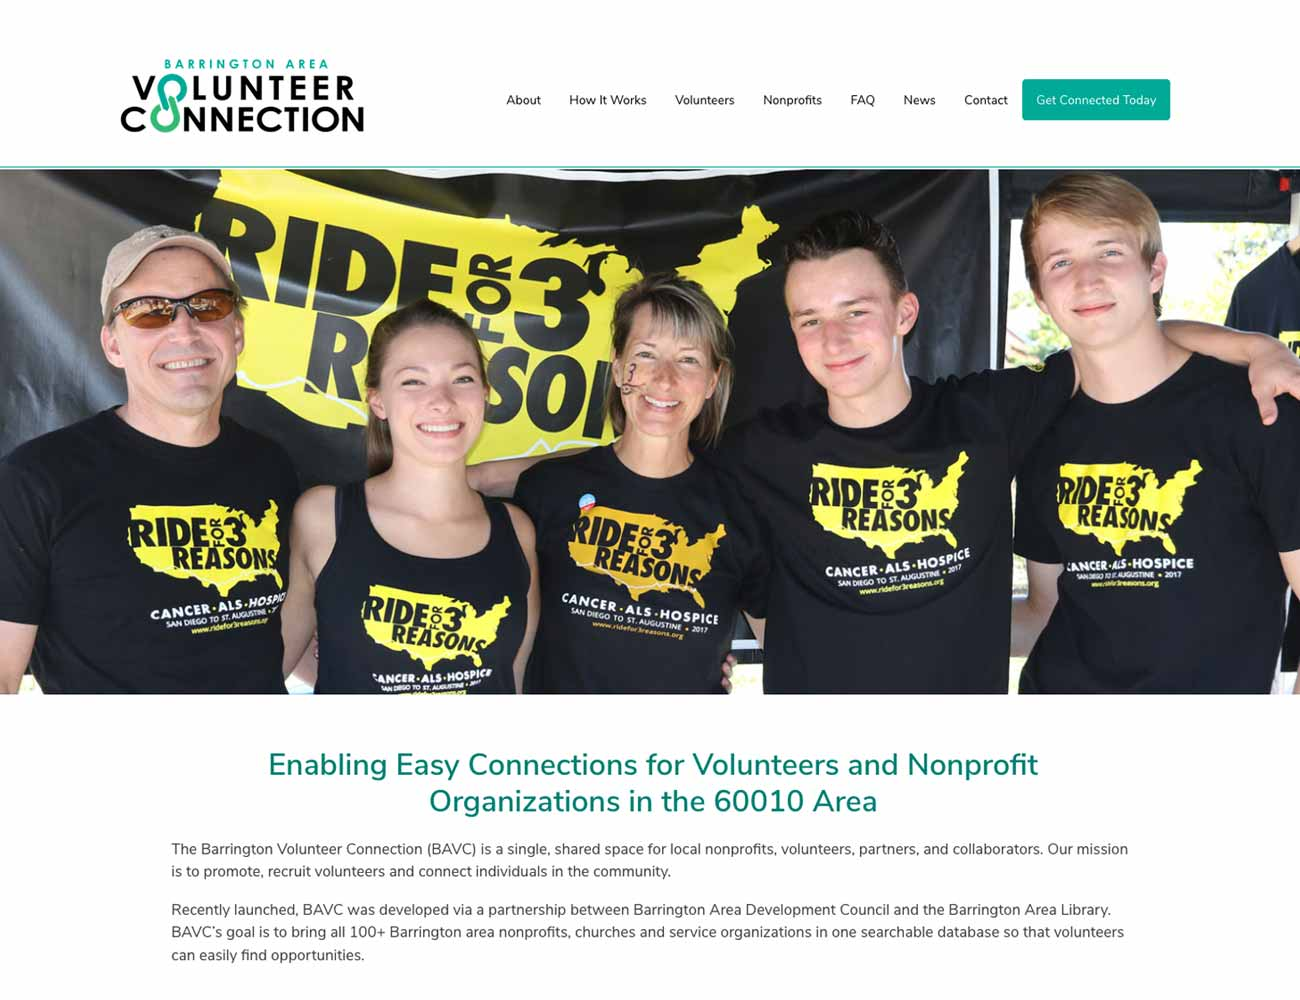 BAVC_Barrington-Area-Volunteer-Connection